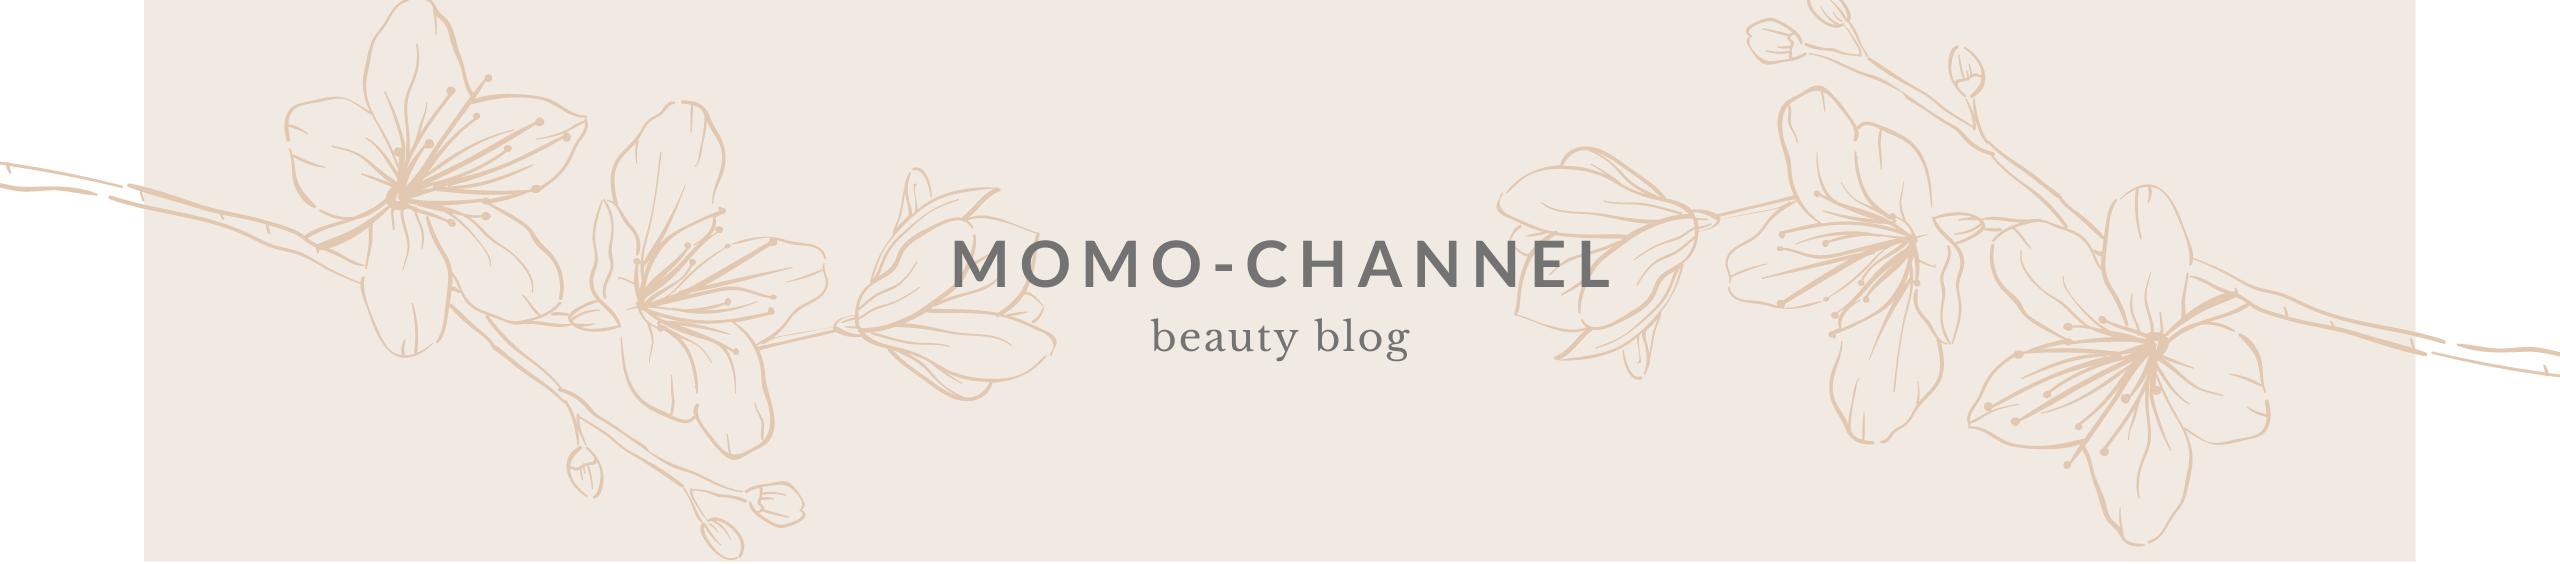 momo-channel